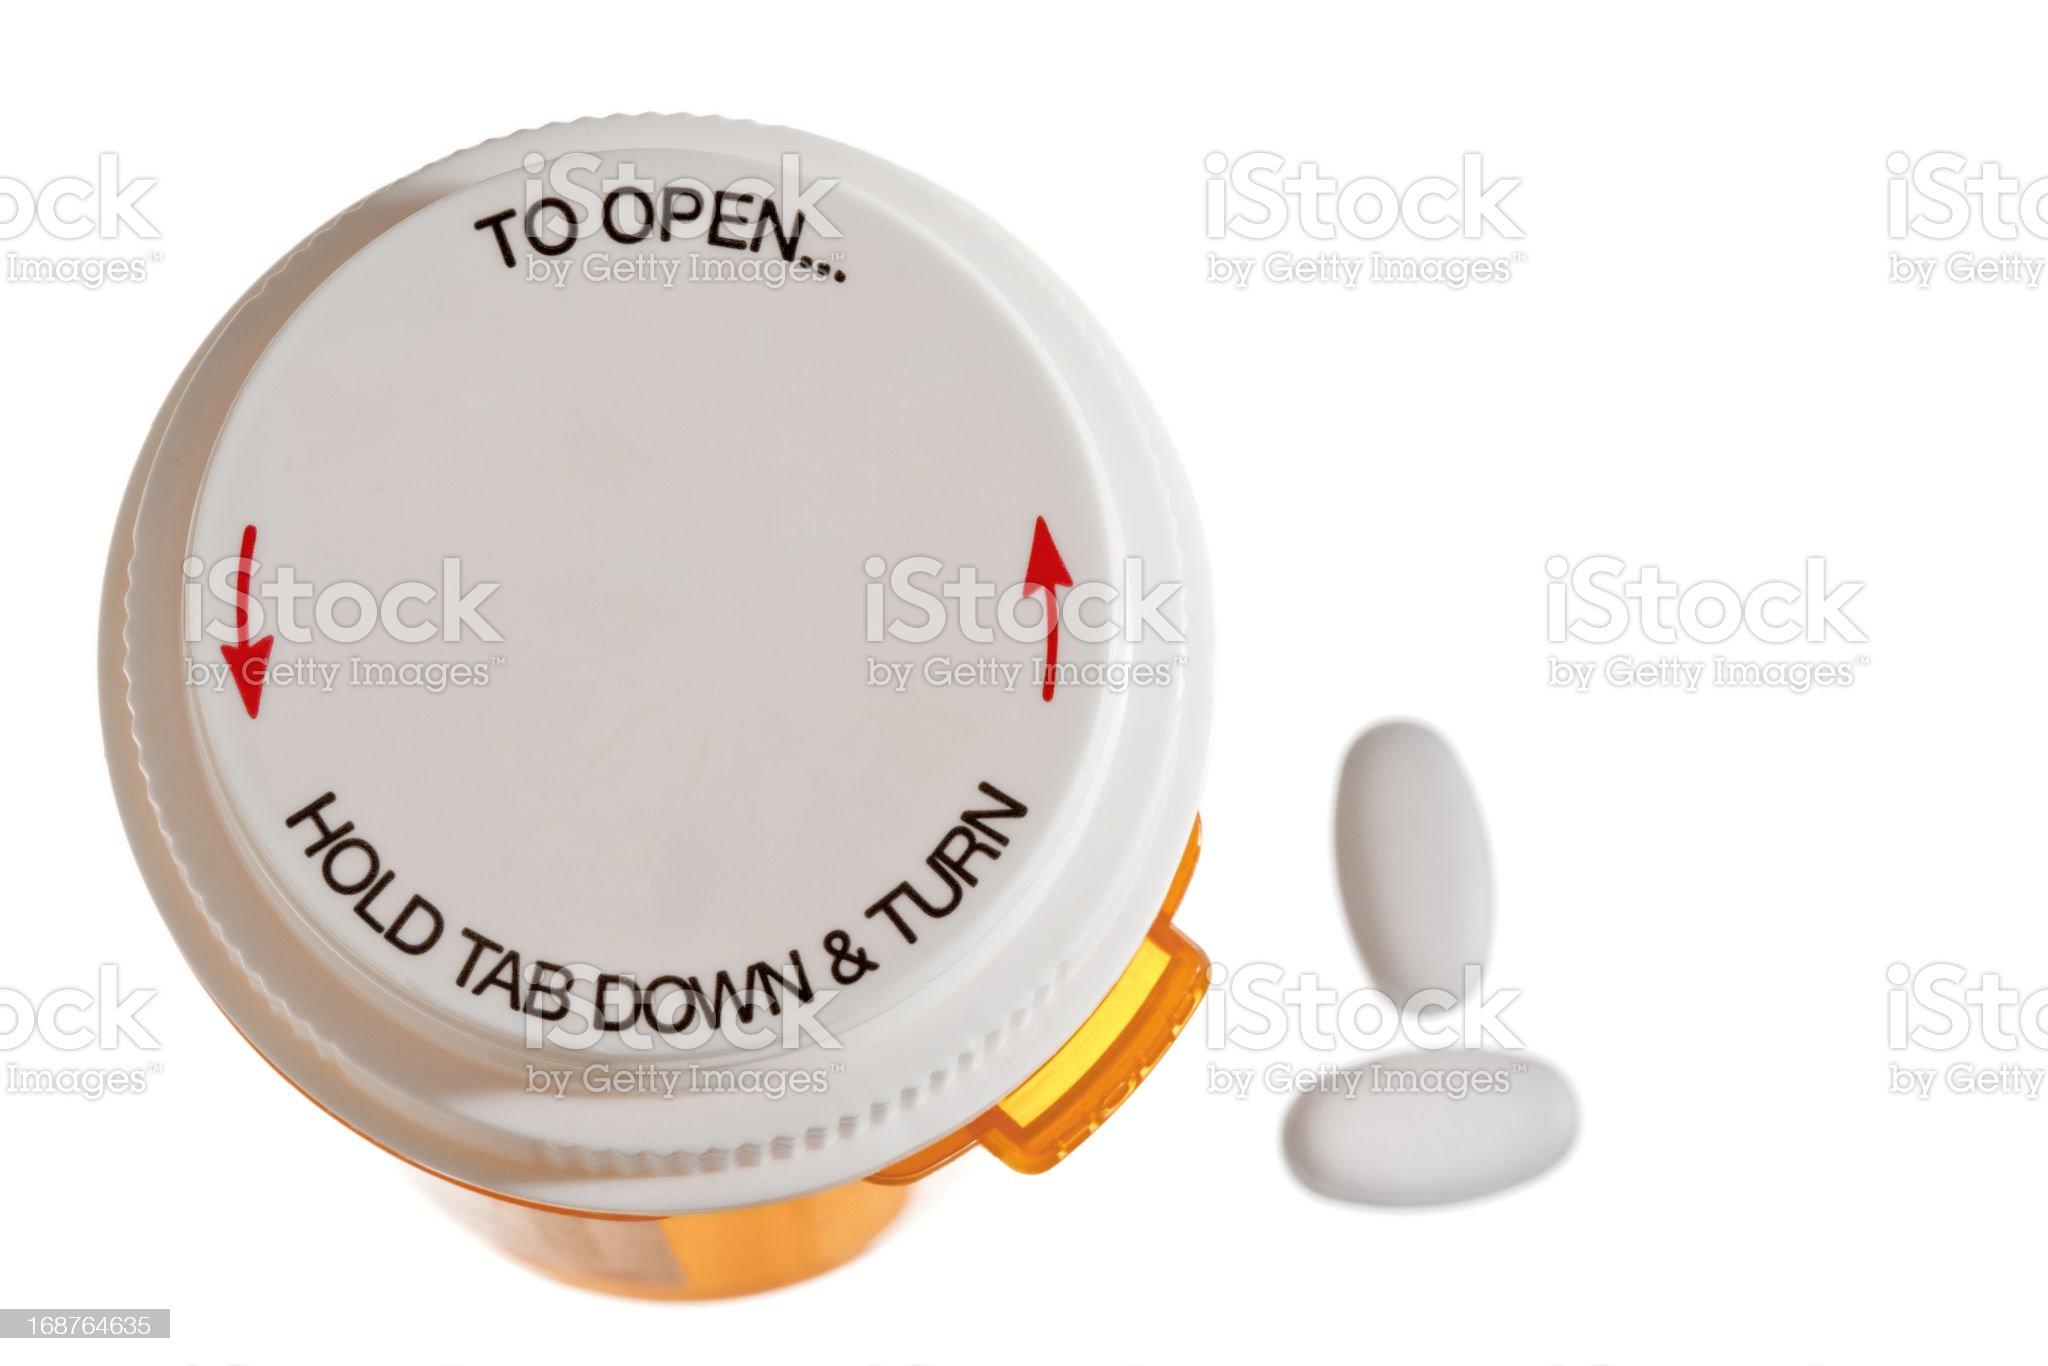 Child Resistant Cap On Prescription Medication Bottle royalty-free stock photo